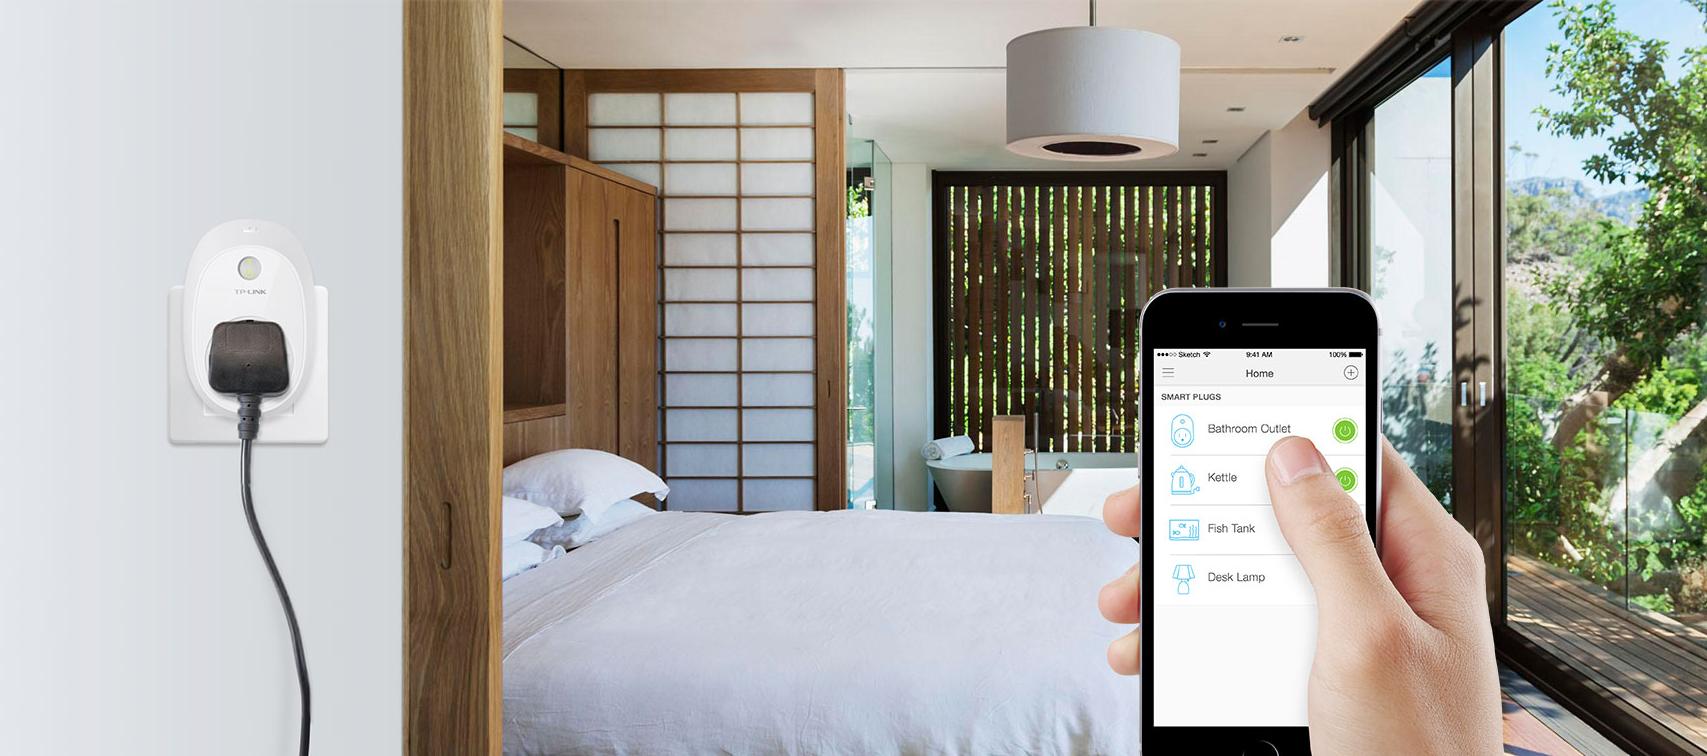 S2 HOME: Por un hogar Smart and Secure